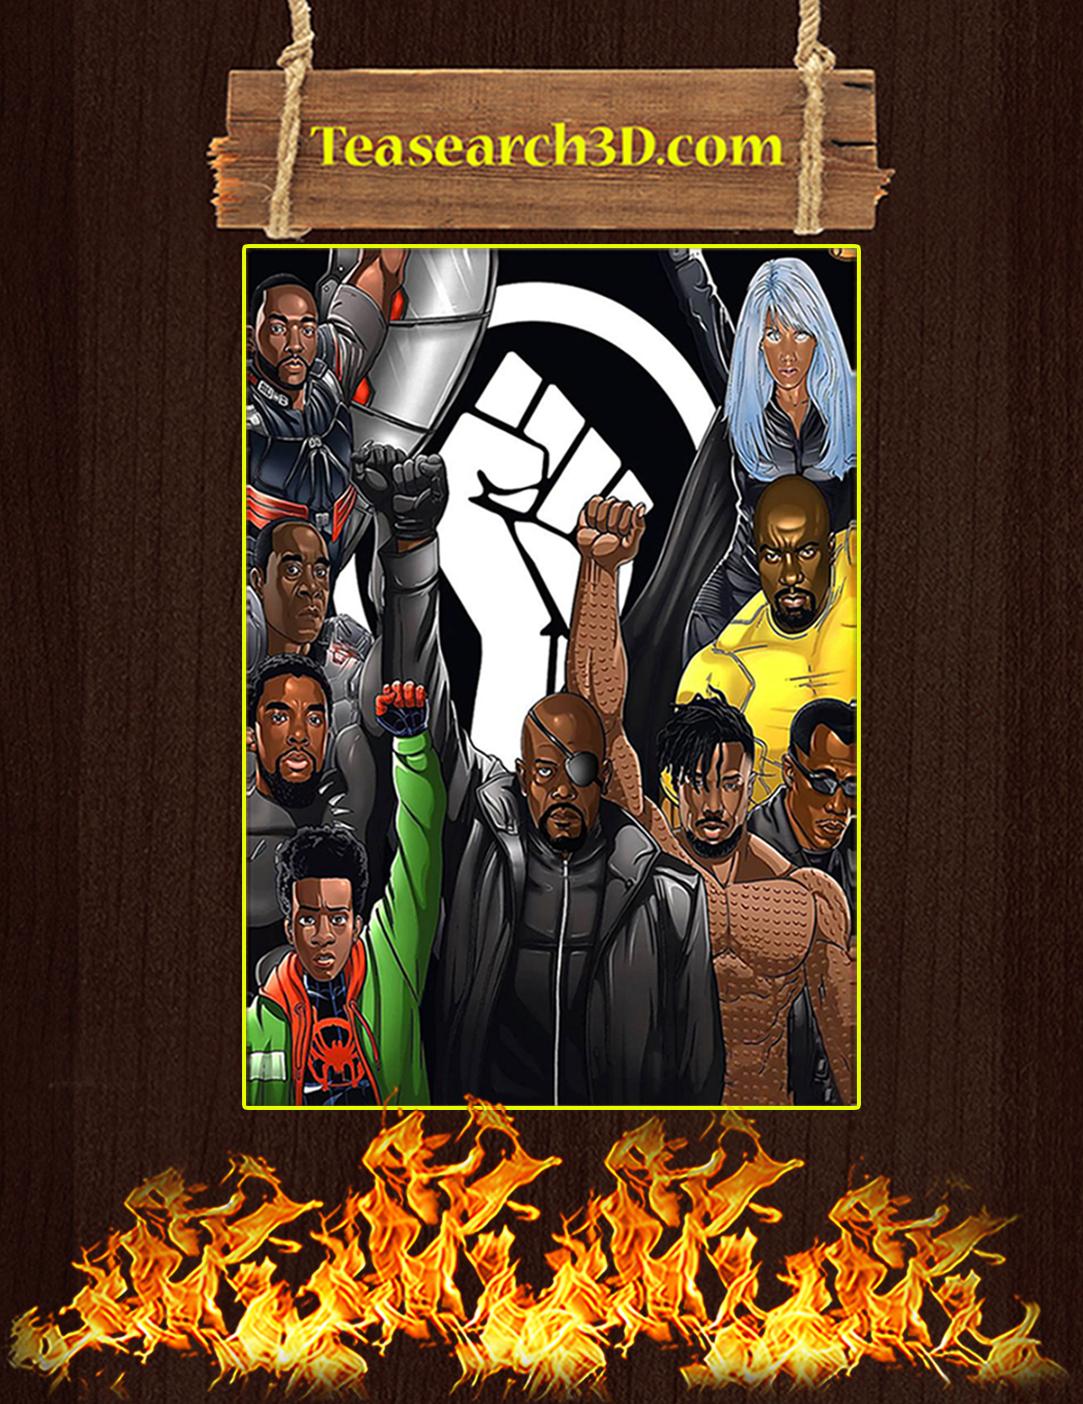 Raised fist black superheroes nick fury miles morales black panther erik killmonger poster A2